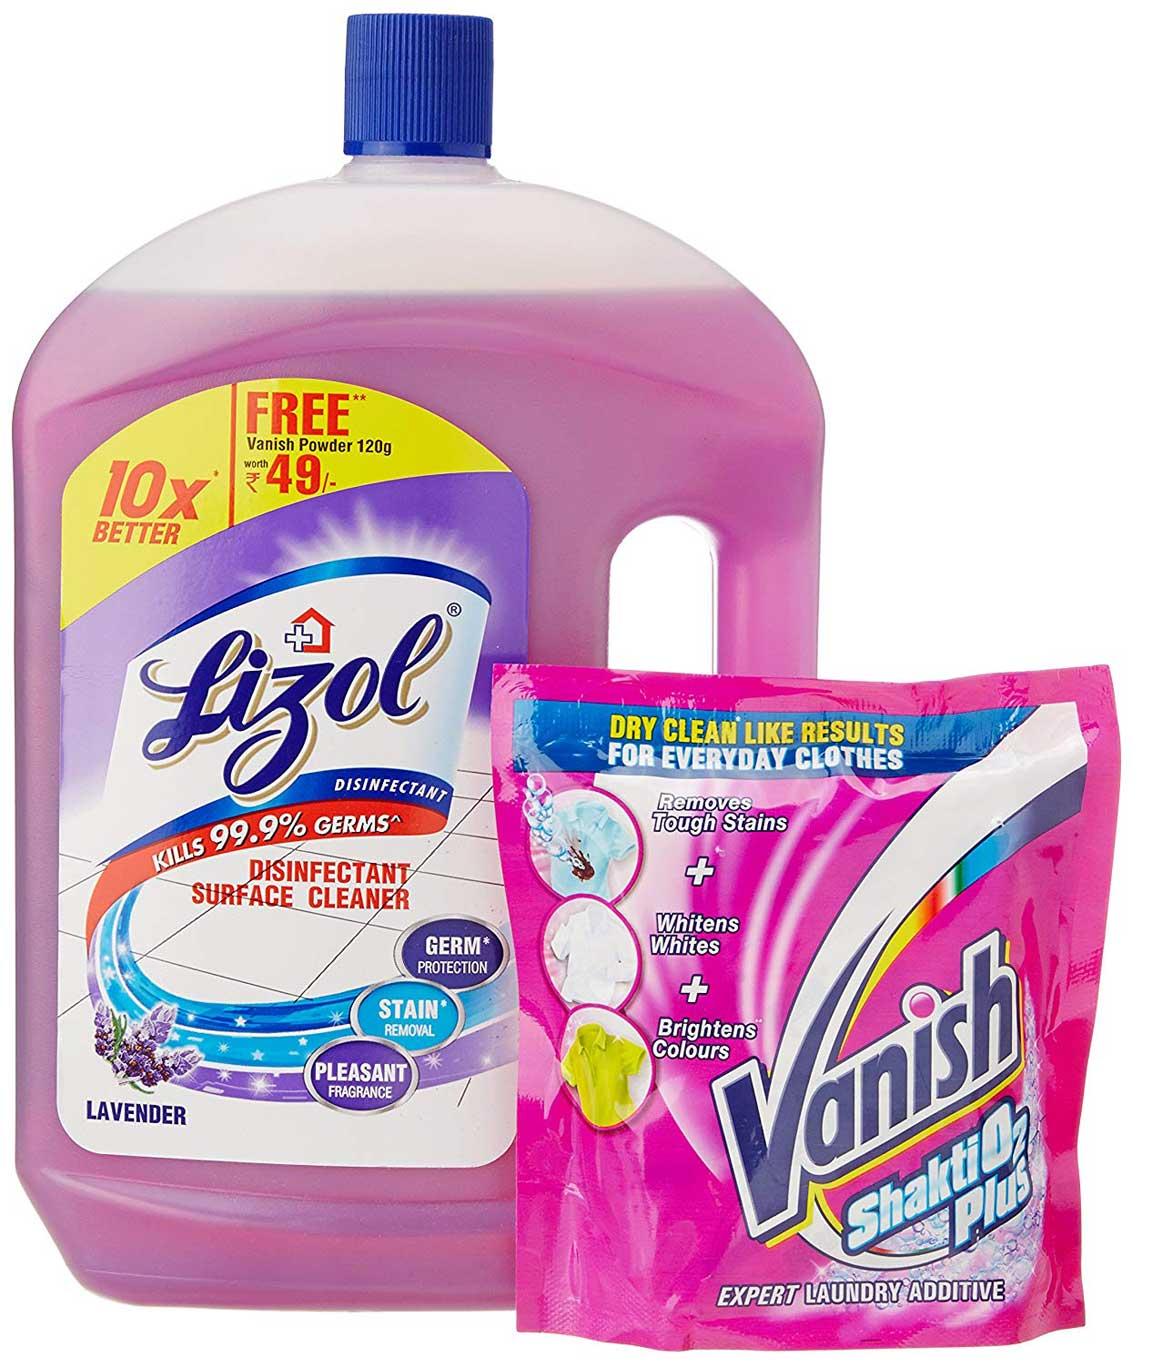 Lizol Floor Cleaner Lavender- 2 L with Free Vanish Powder - 120 g